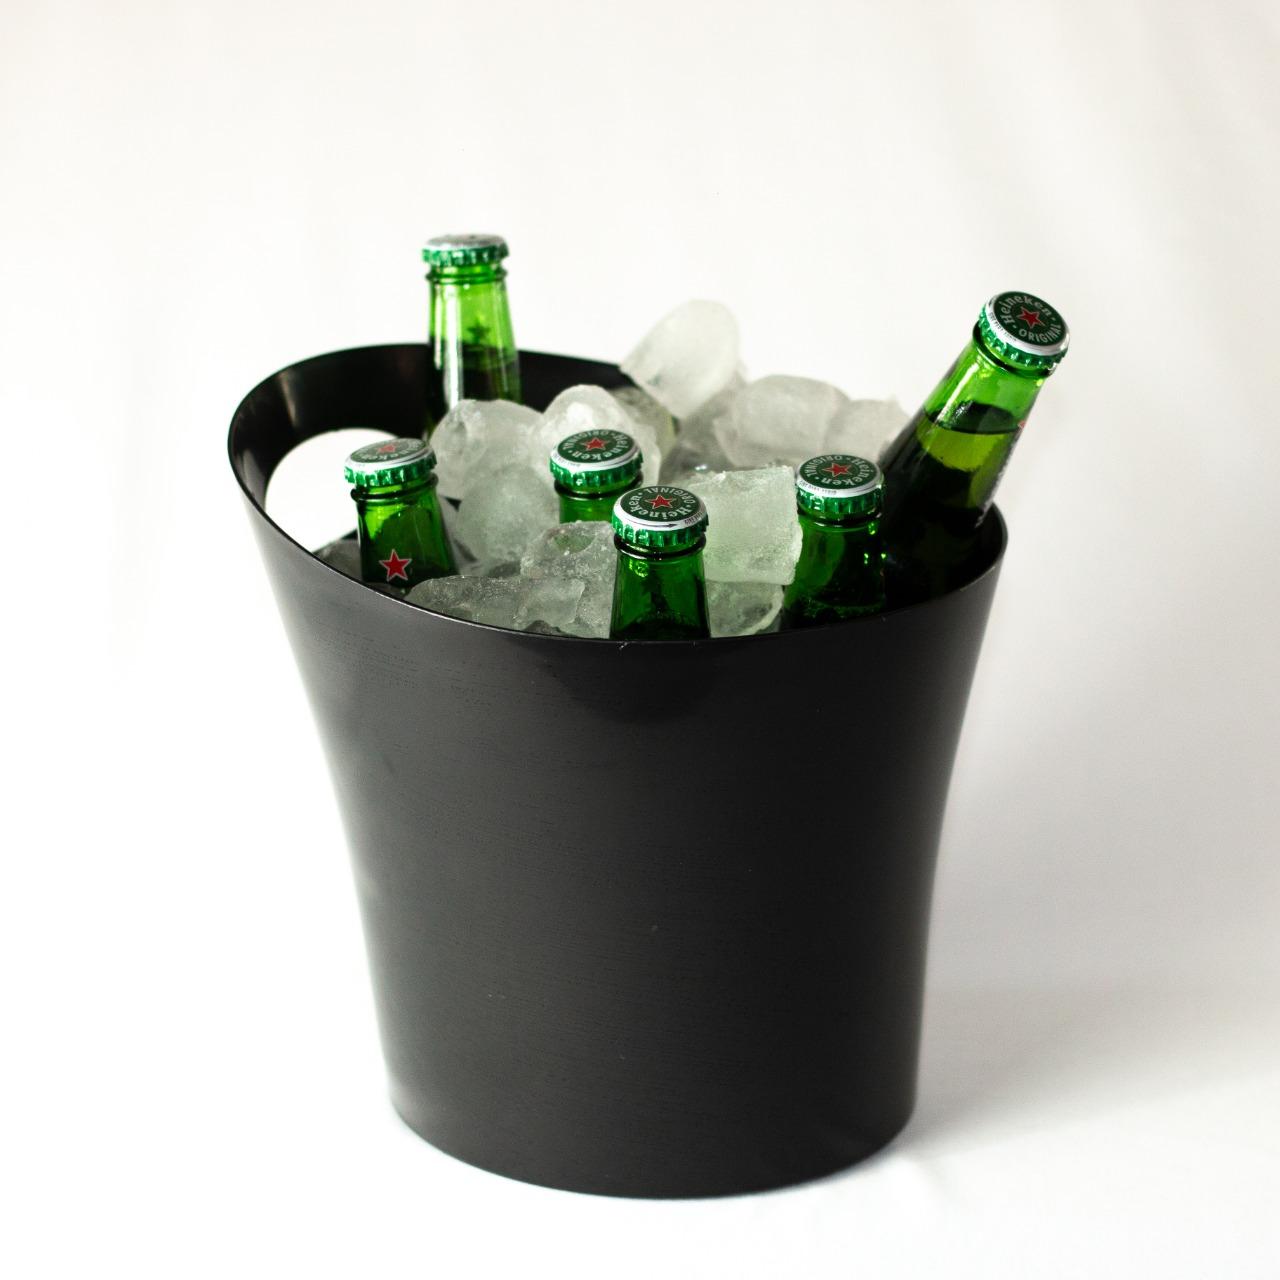 10 Baldes de Gelo 4,5 L para Cerveja Baldinhos Gelo + 4 Copos Long Drink